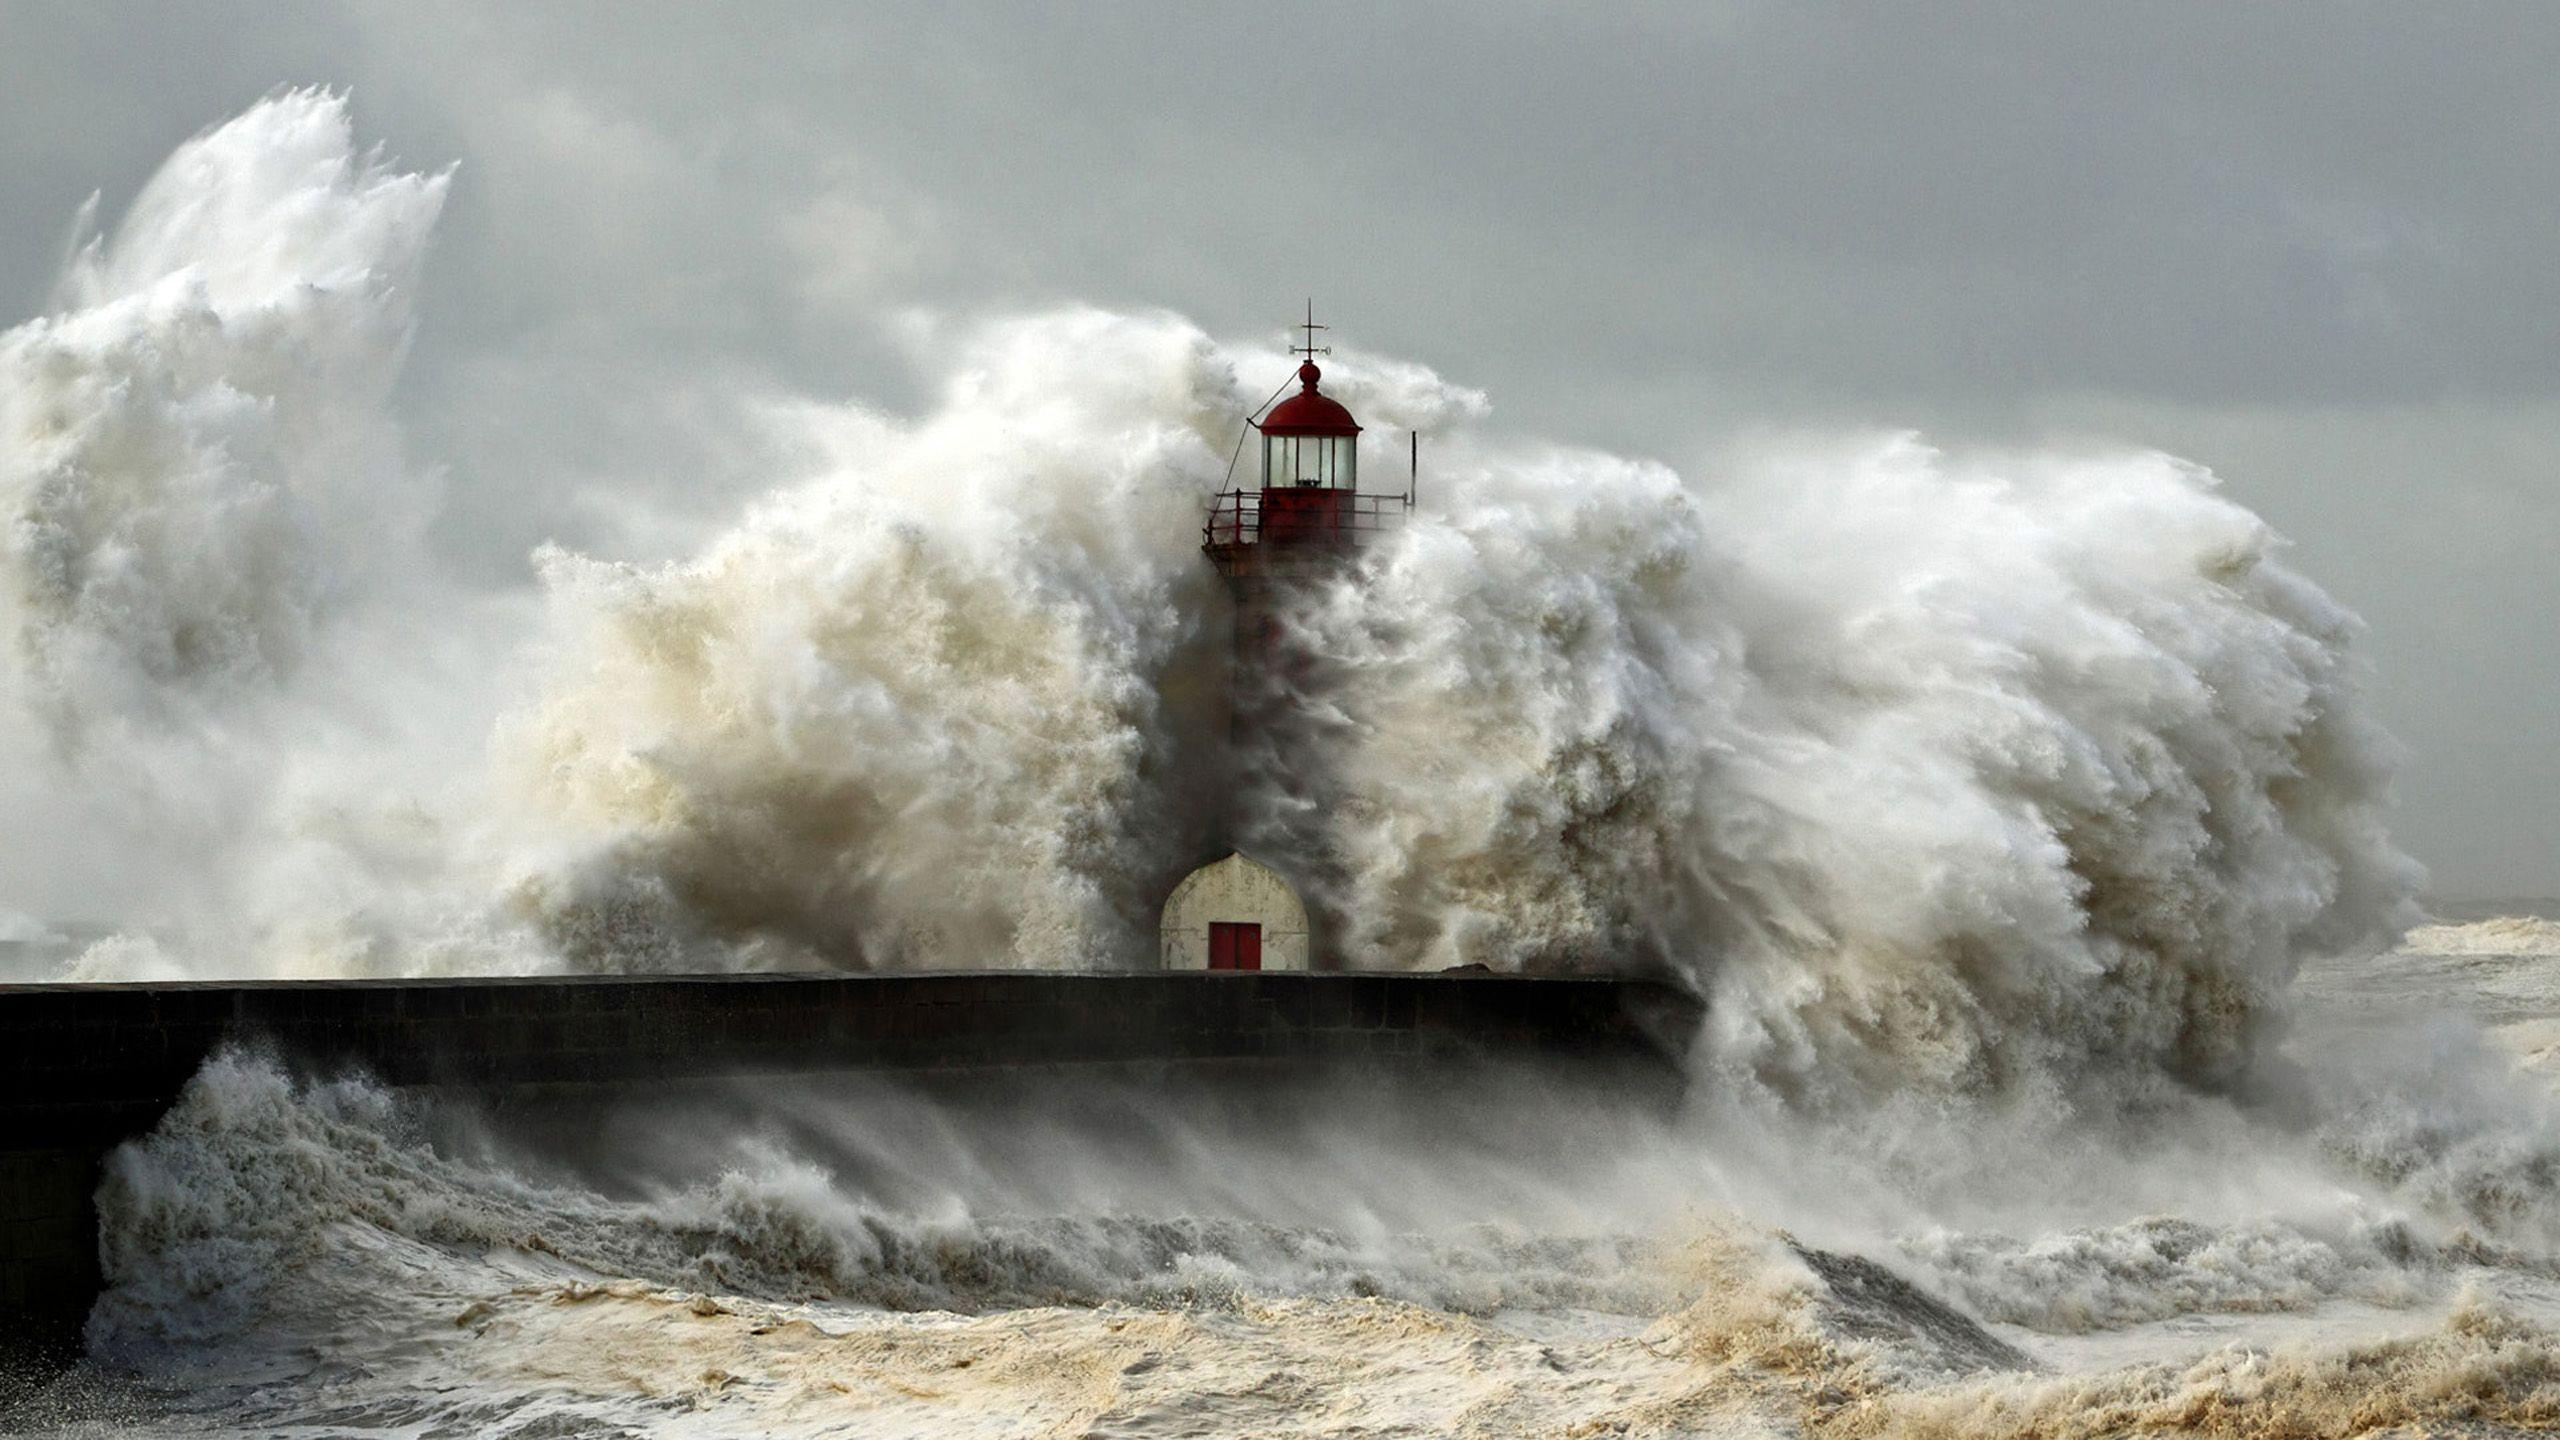 Bing natural tsunami wallpaper, HD Wallpaper Downloads